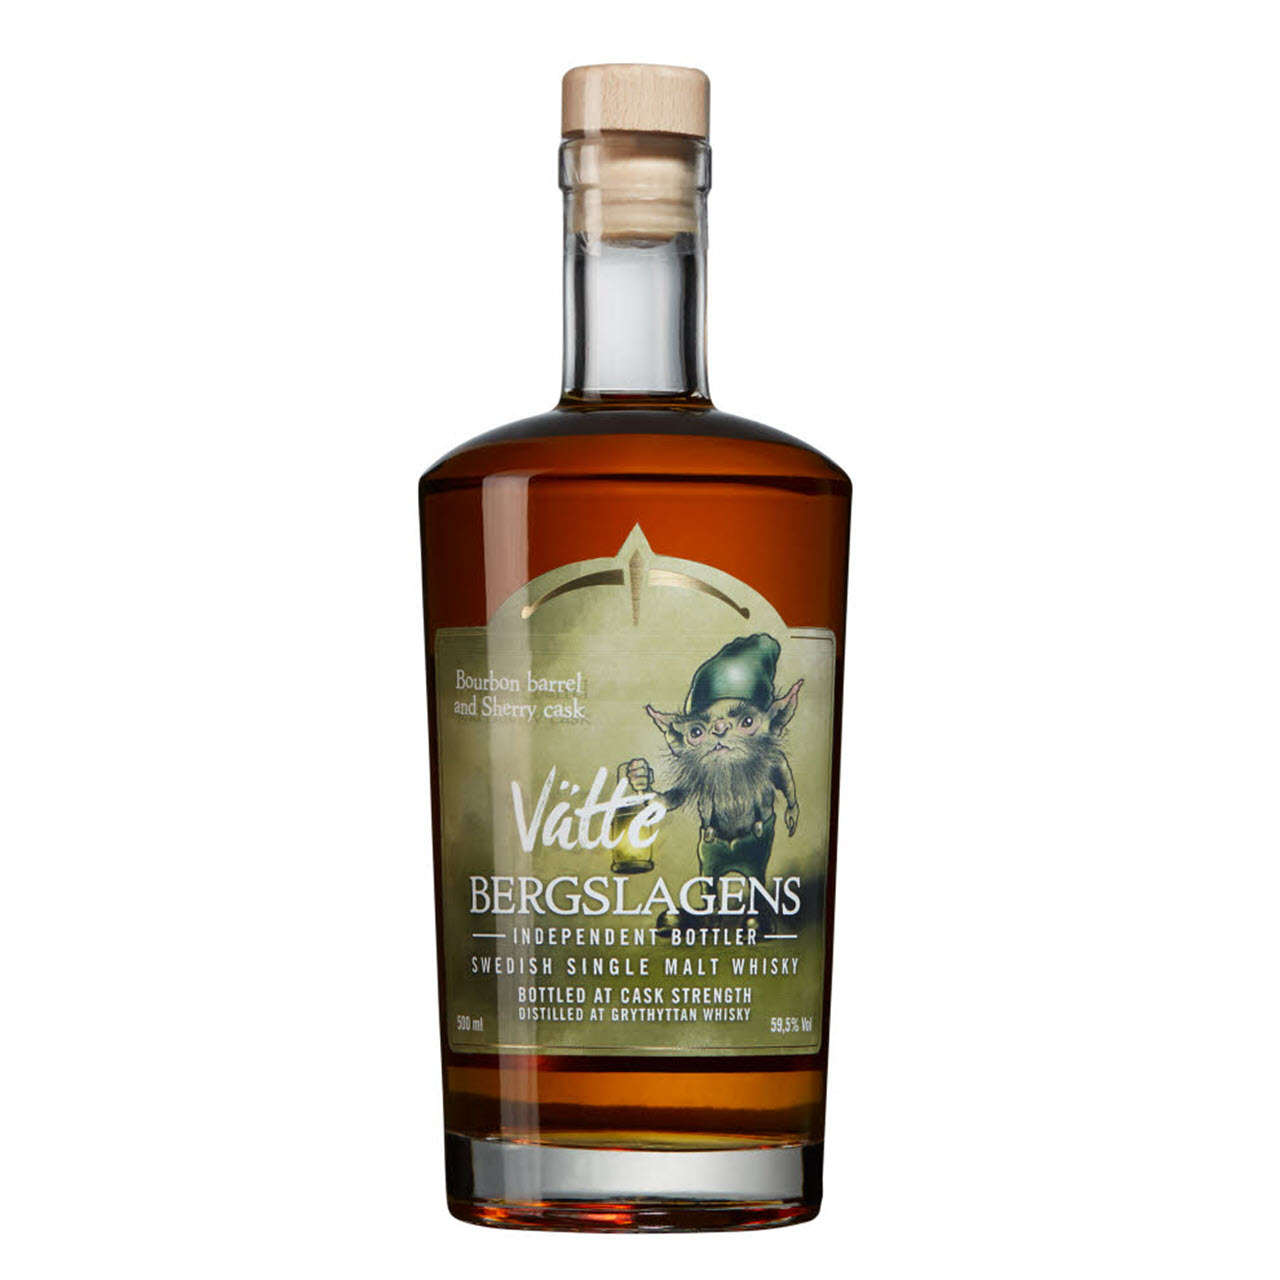 Nordic whisky #191 - Grythyttan Vätte